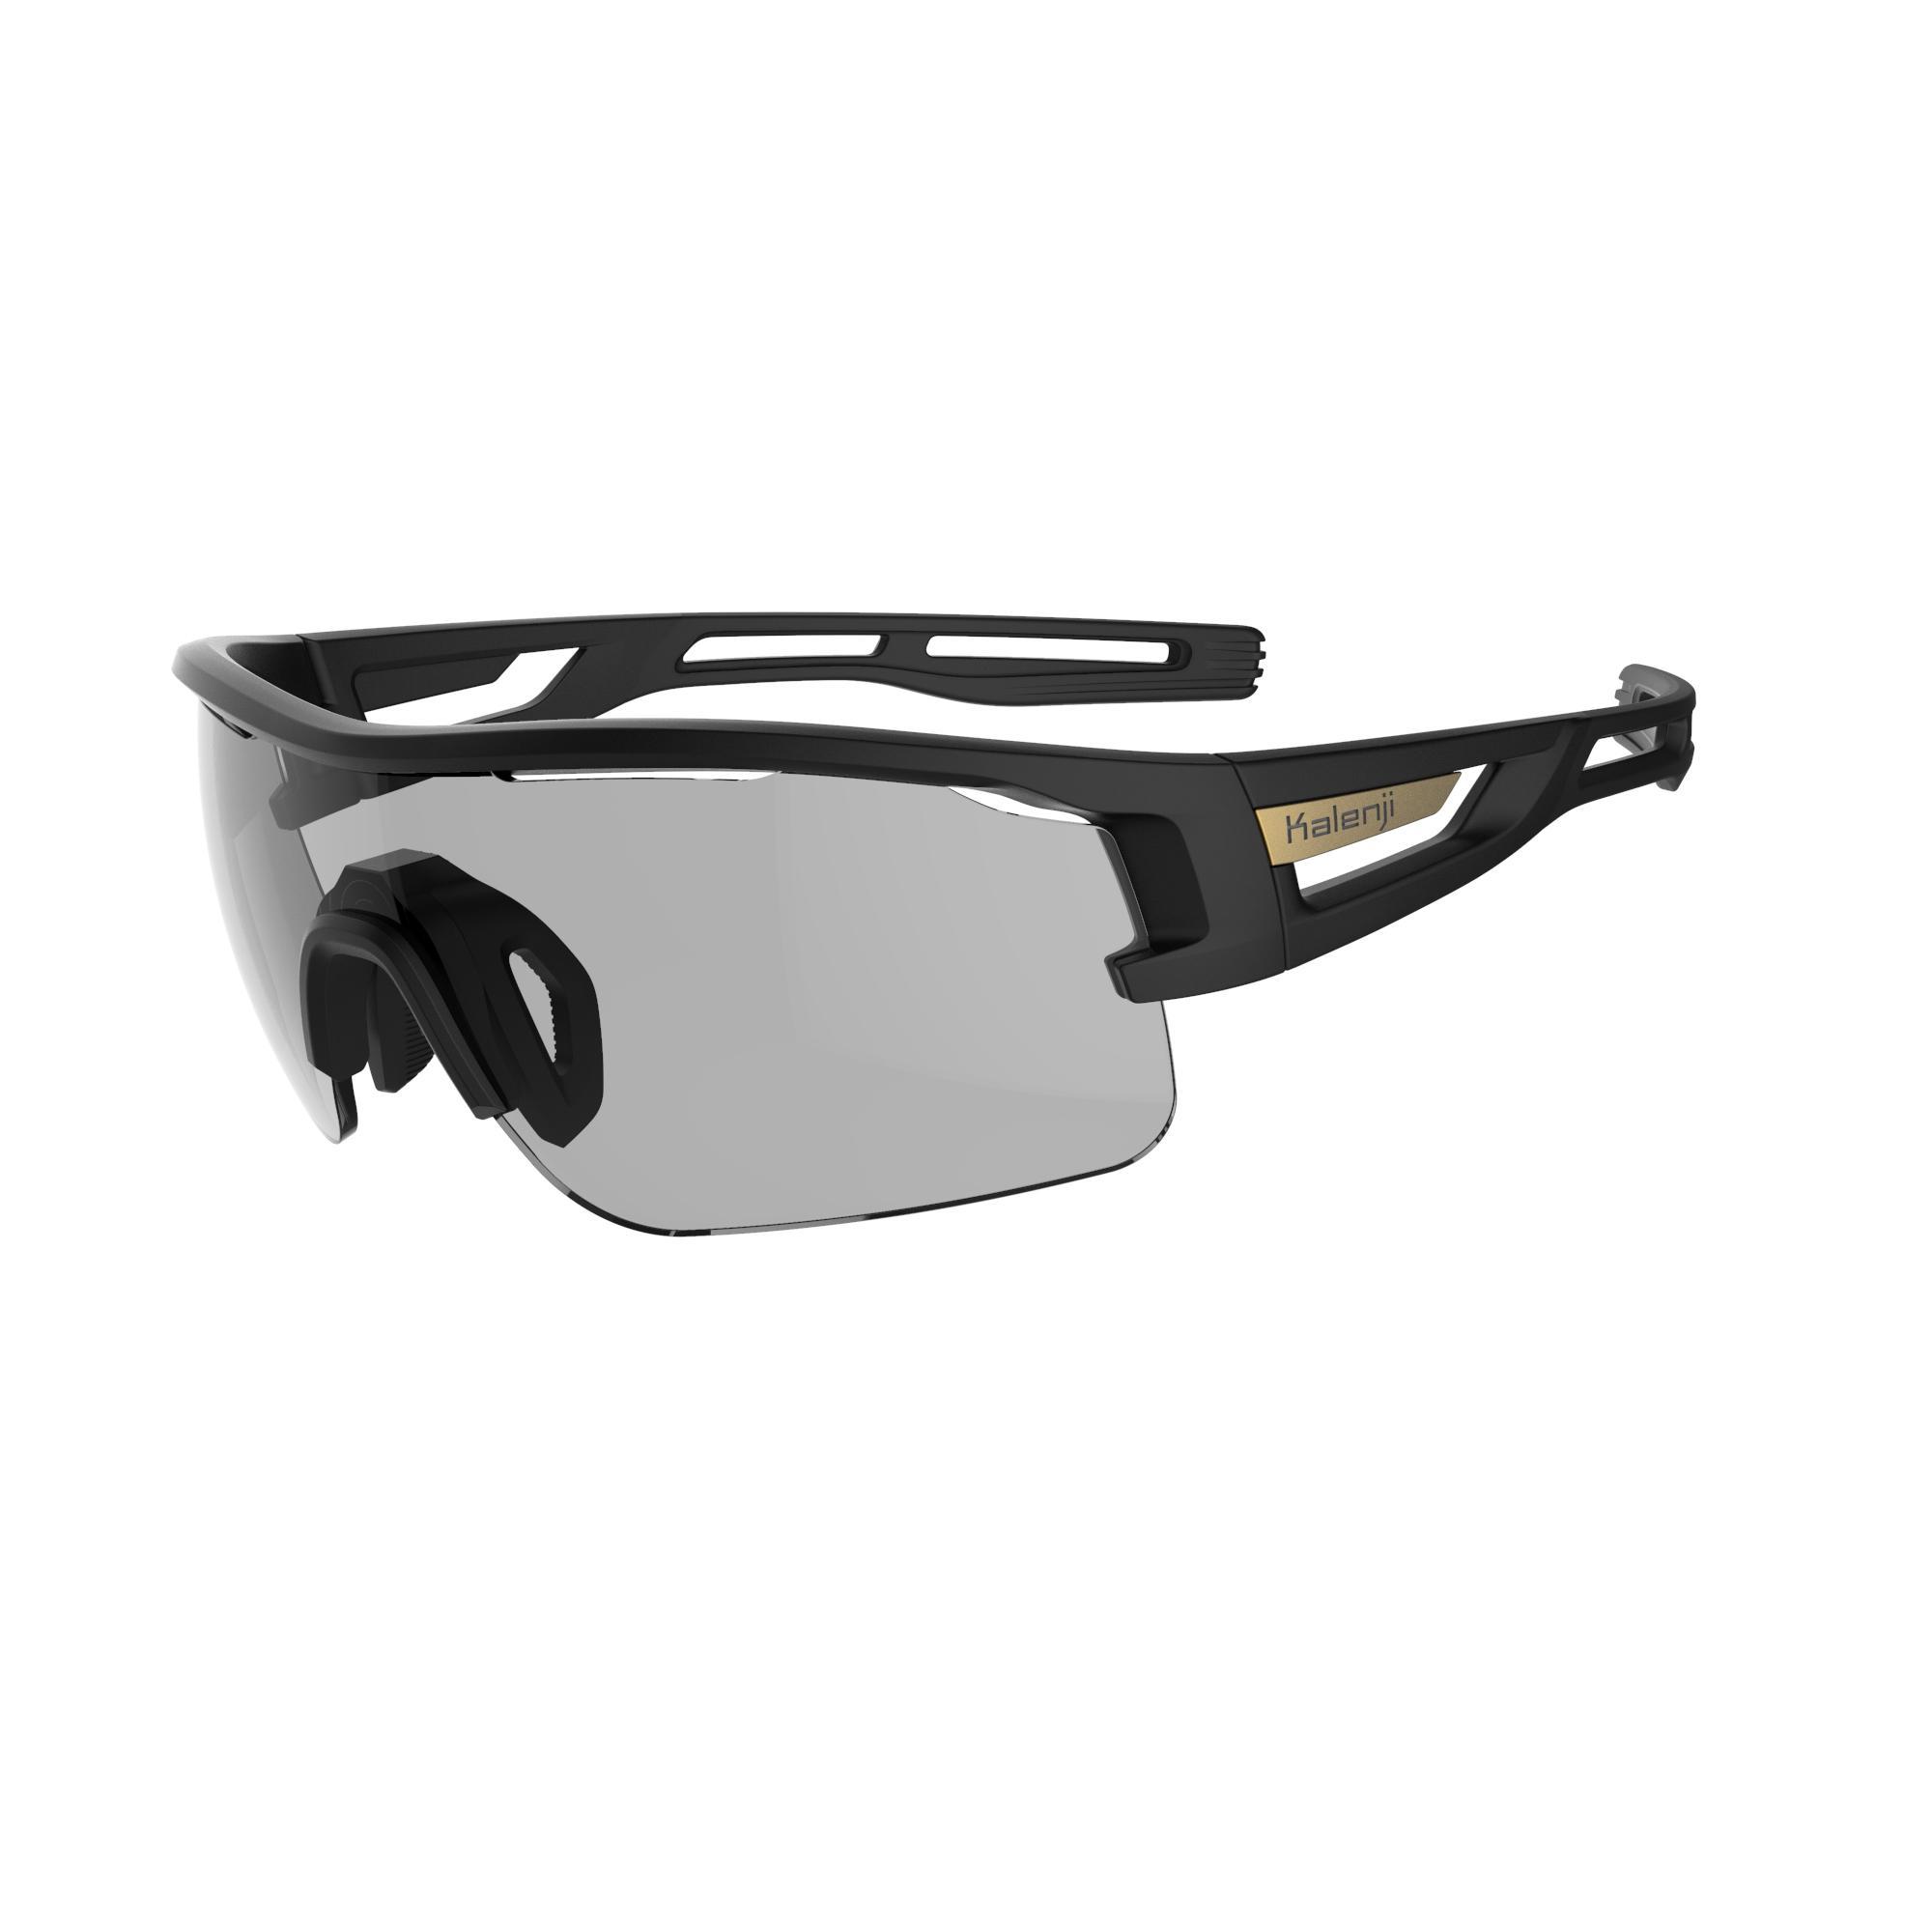 ba58f7f20887 Comprar Gafas de Sol de Hombre Online | Decathlon